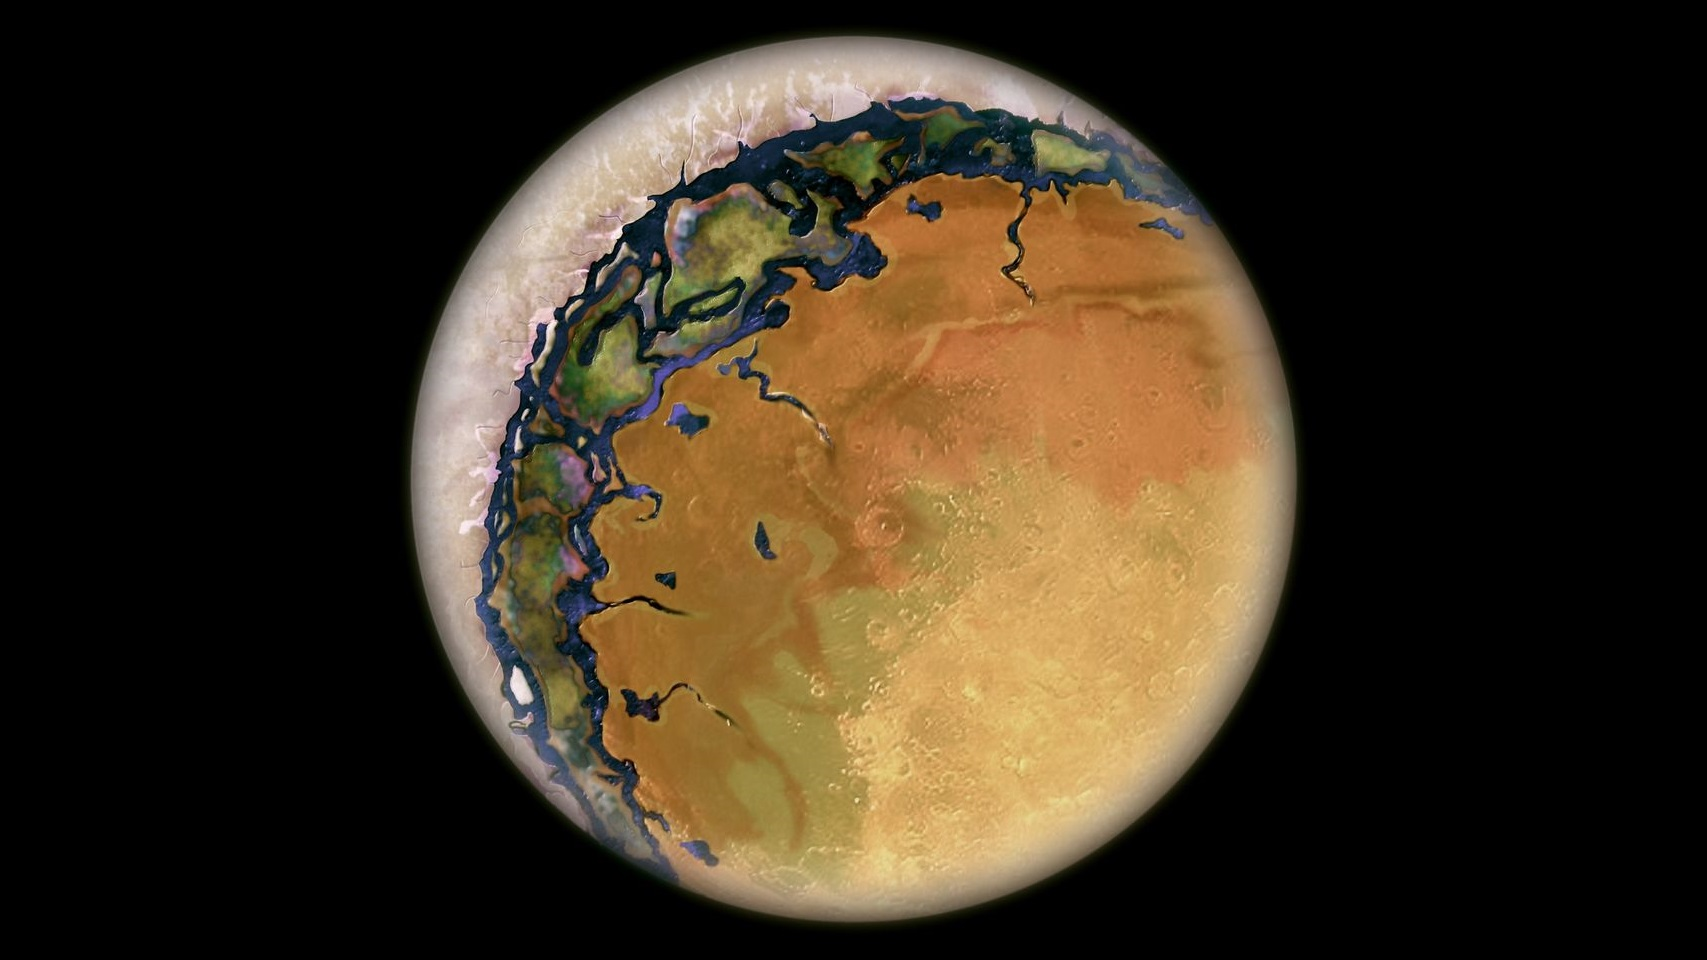 Planeta ocular quente